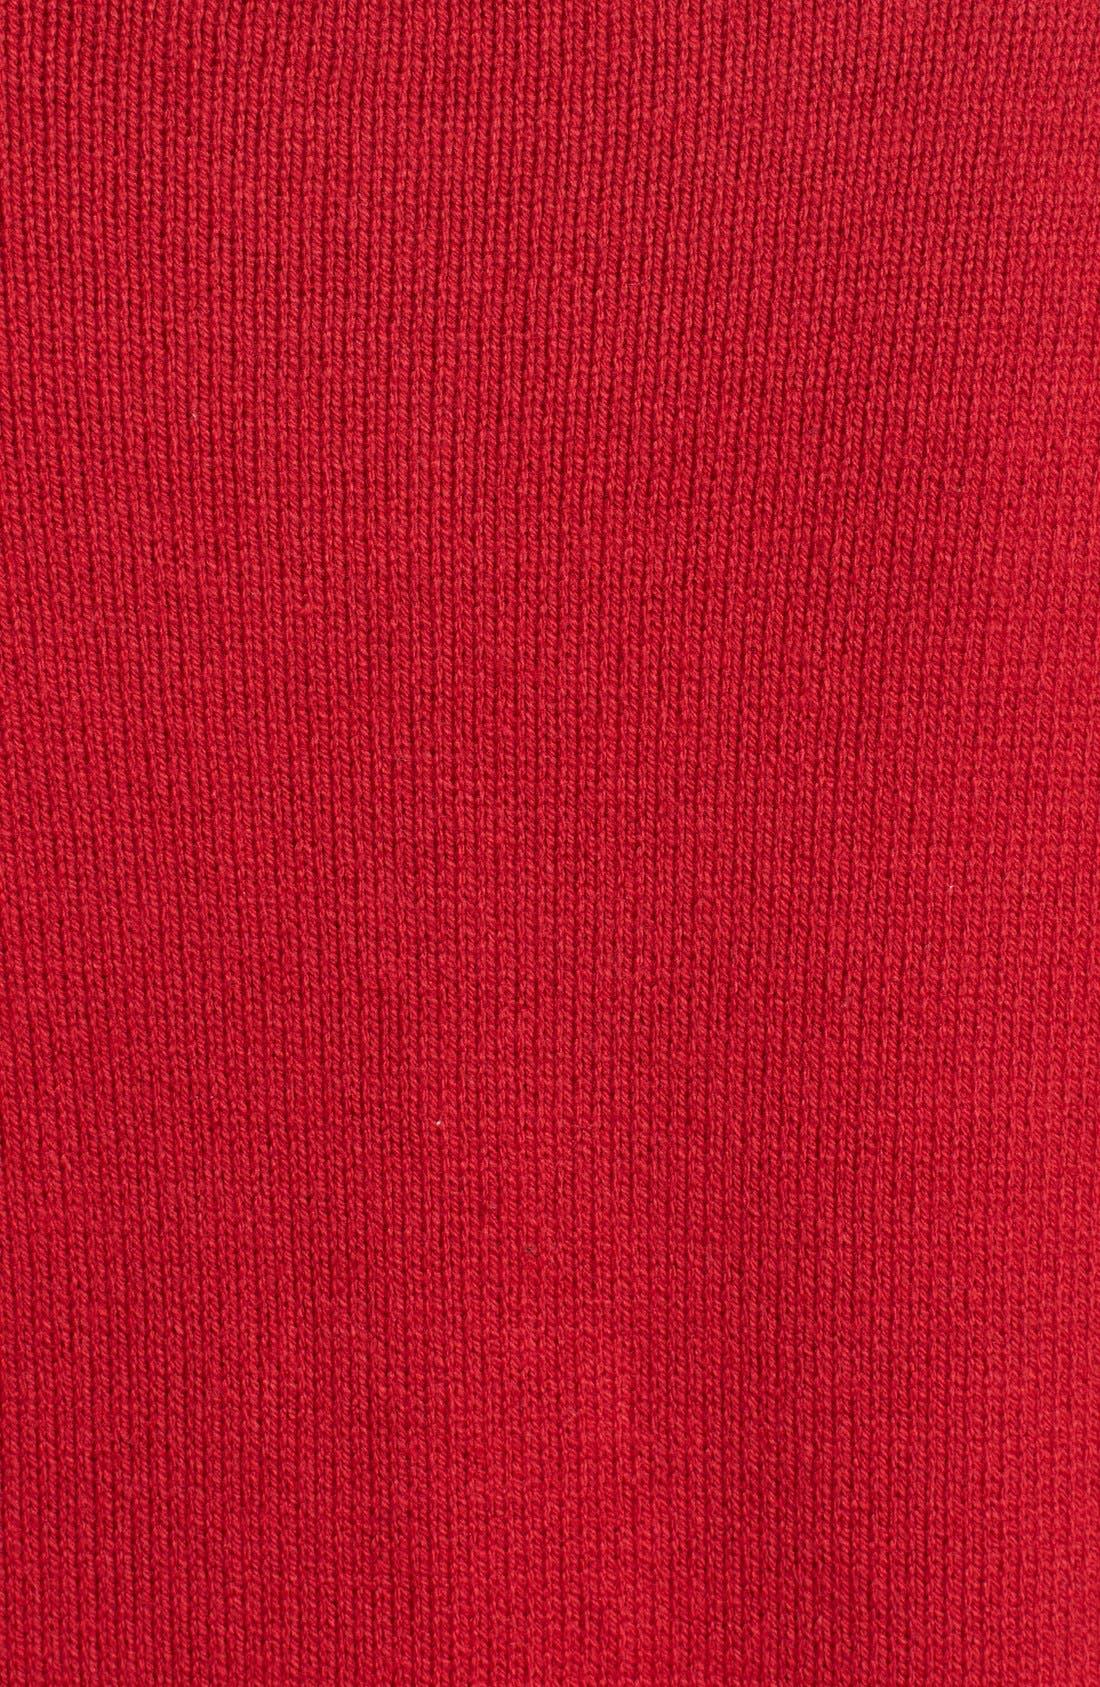 Alternate Image 5  - Ugly Christmas Sweater 'Penguin' Light-Up Fair Isle Knit Sweater